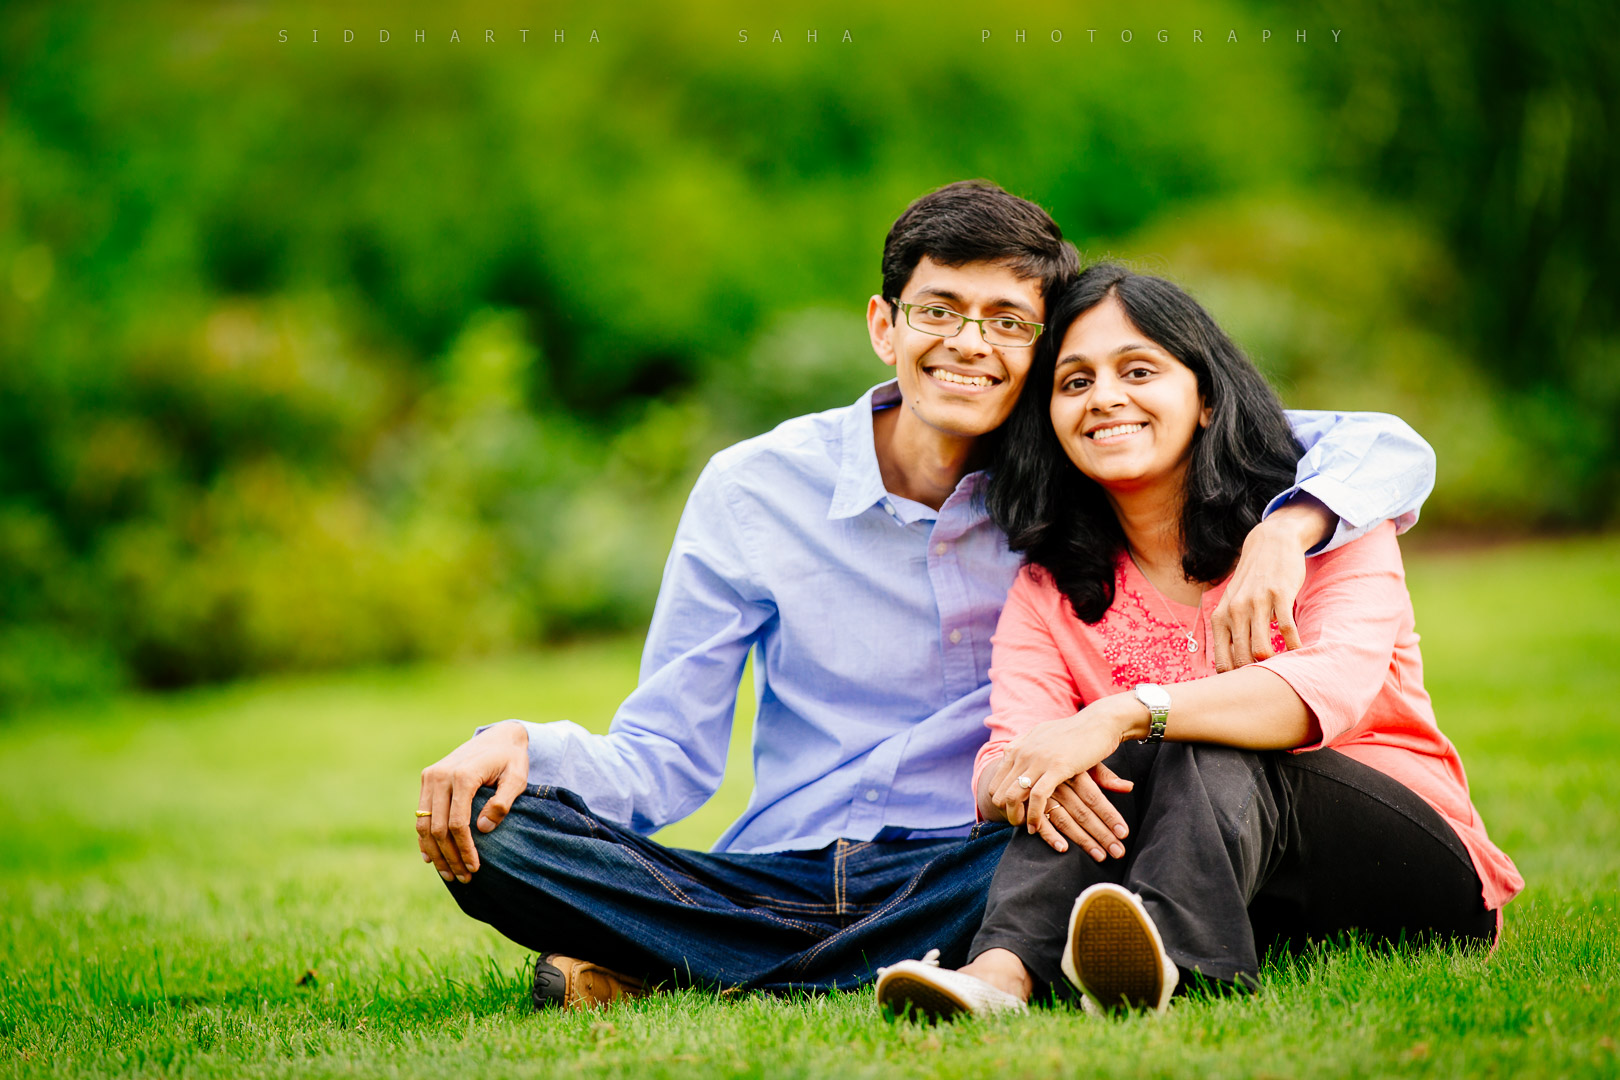 2015-08-08 - Padmaja Ketan Family Photoshoot - _05Y8901